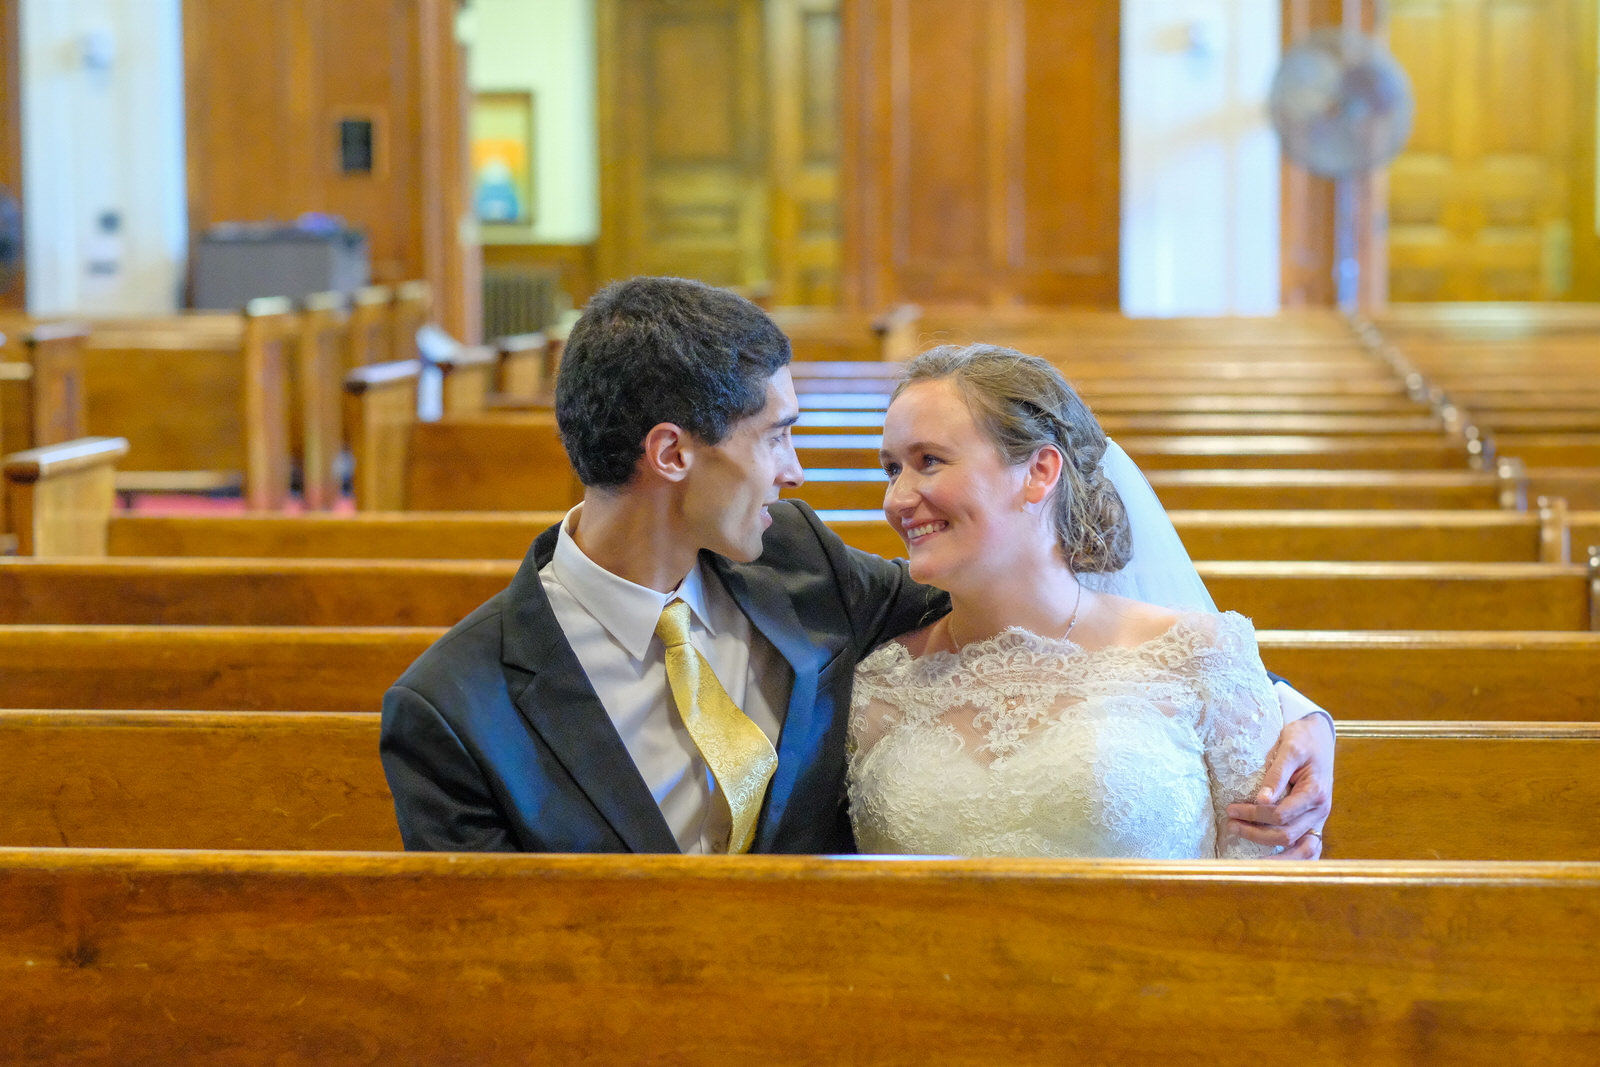 candid-vermont-wedding-photography-866.jpg